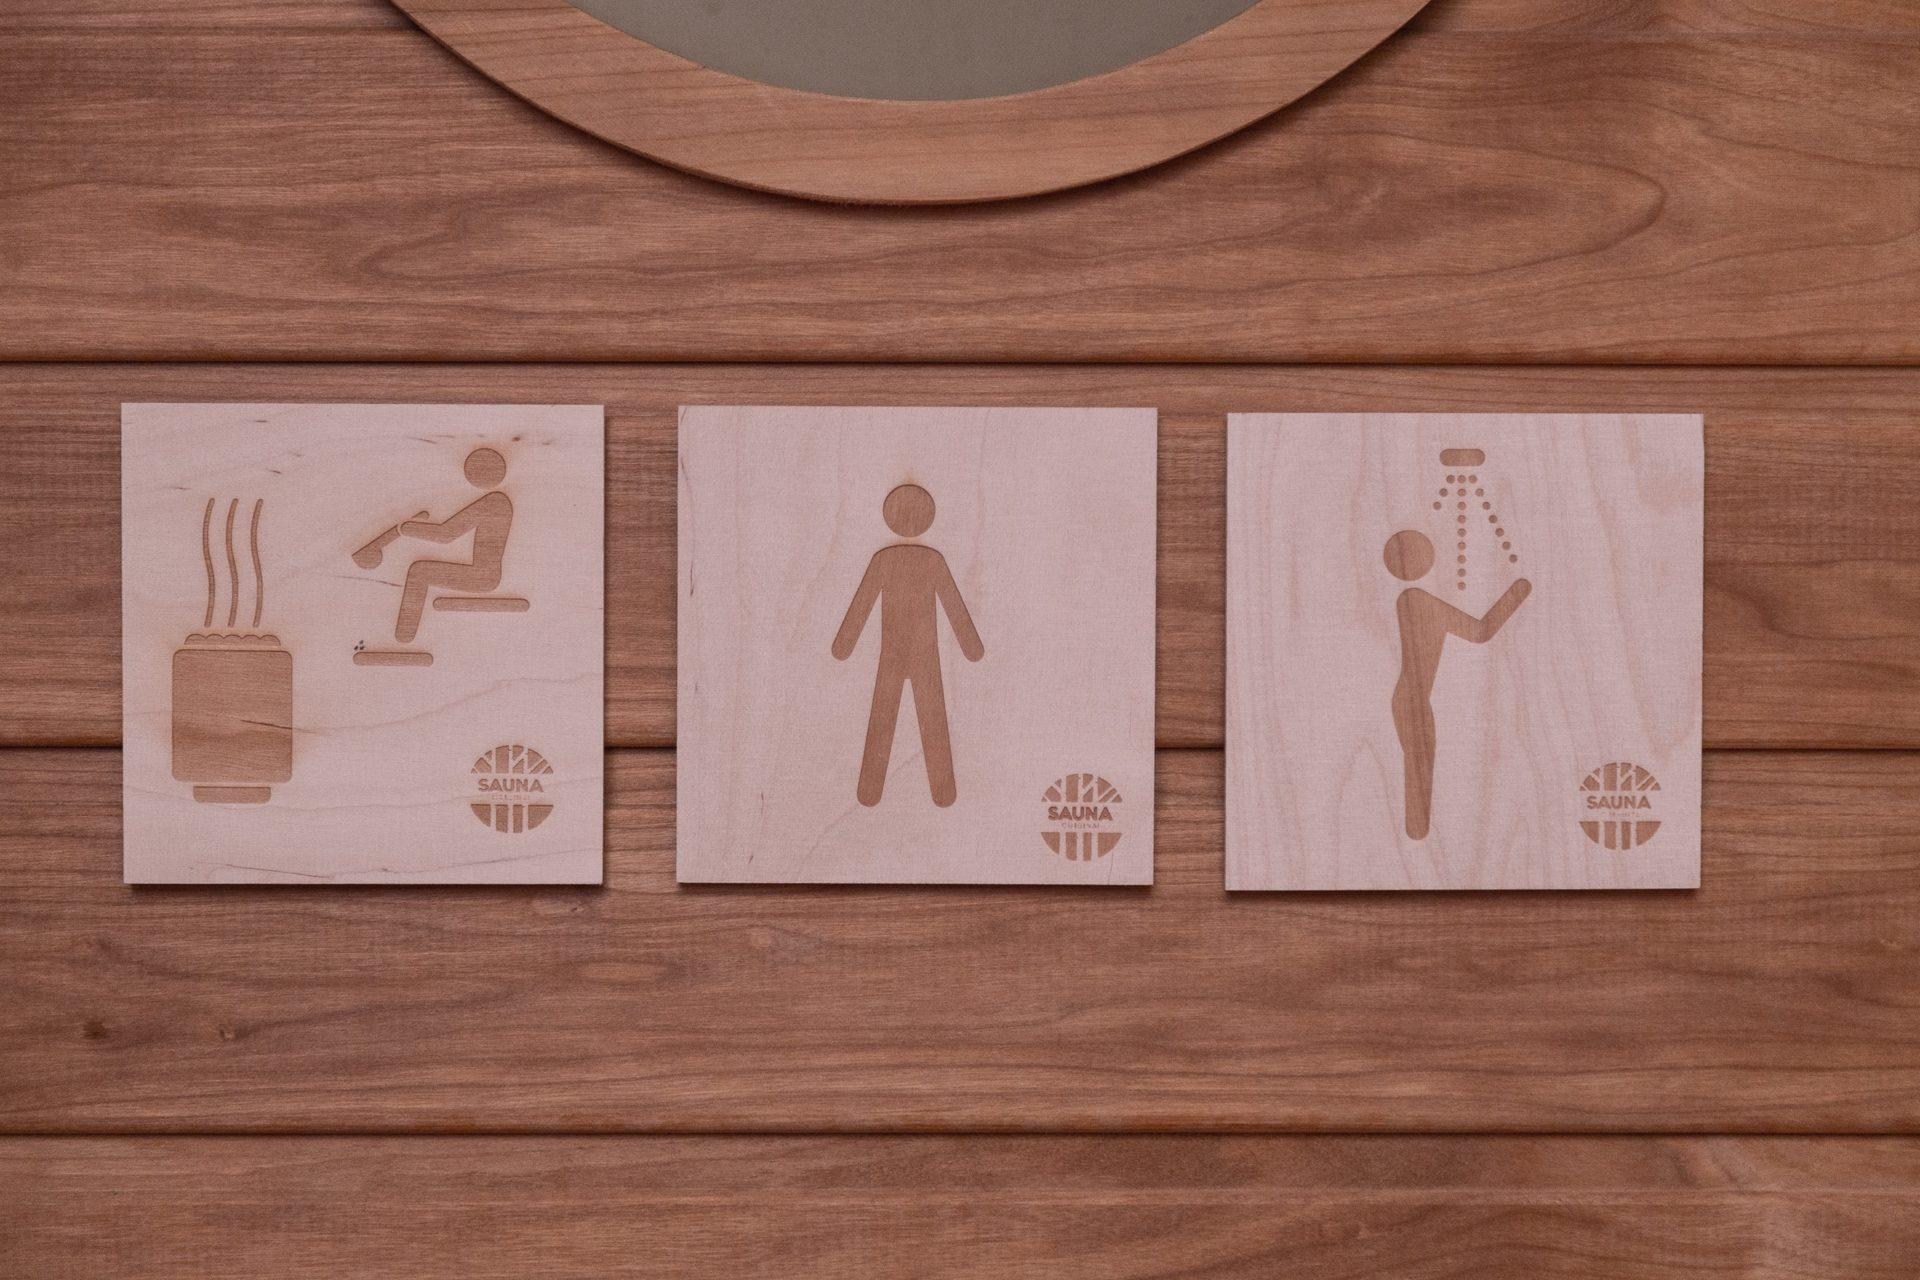 Sauna symbols